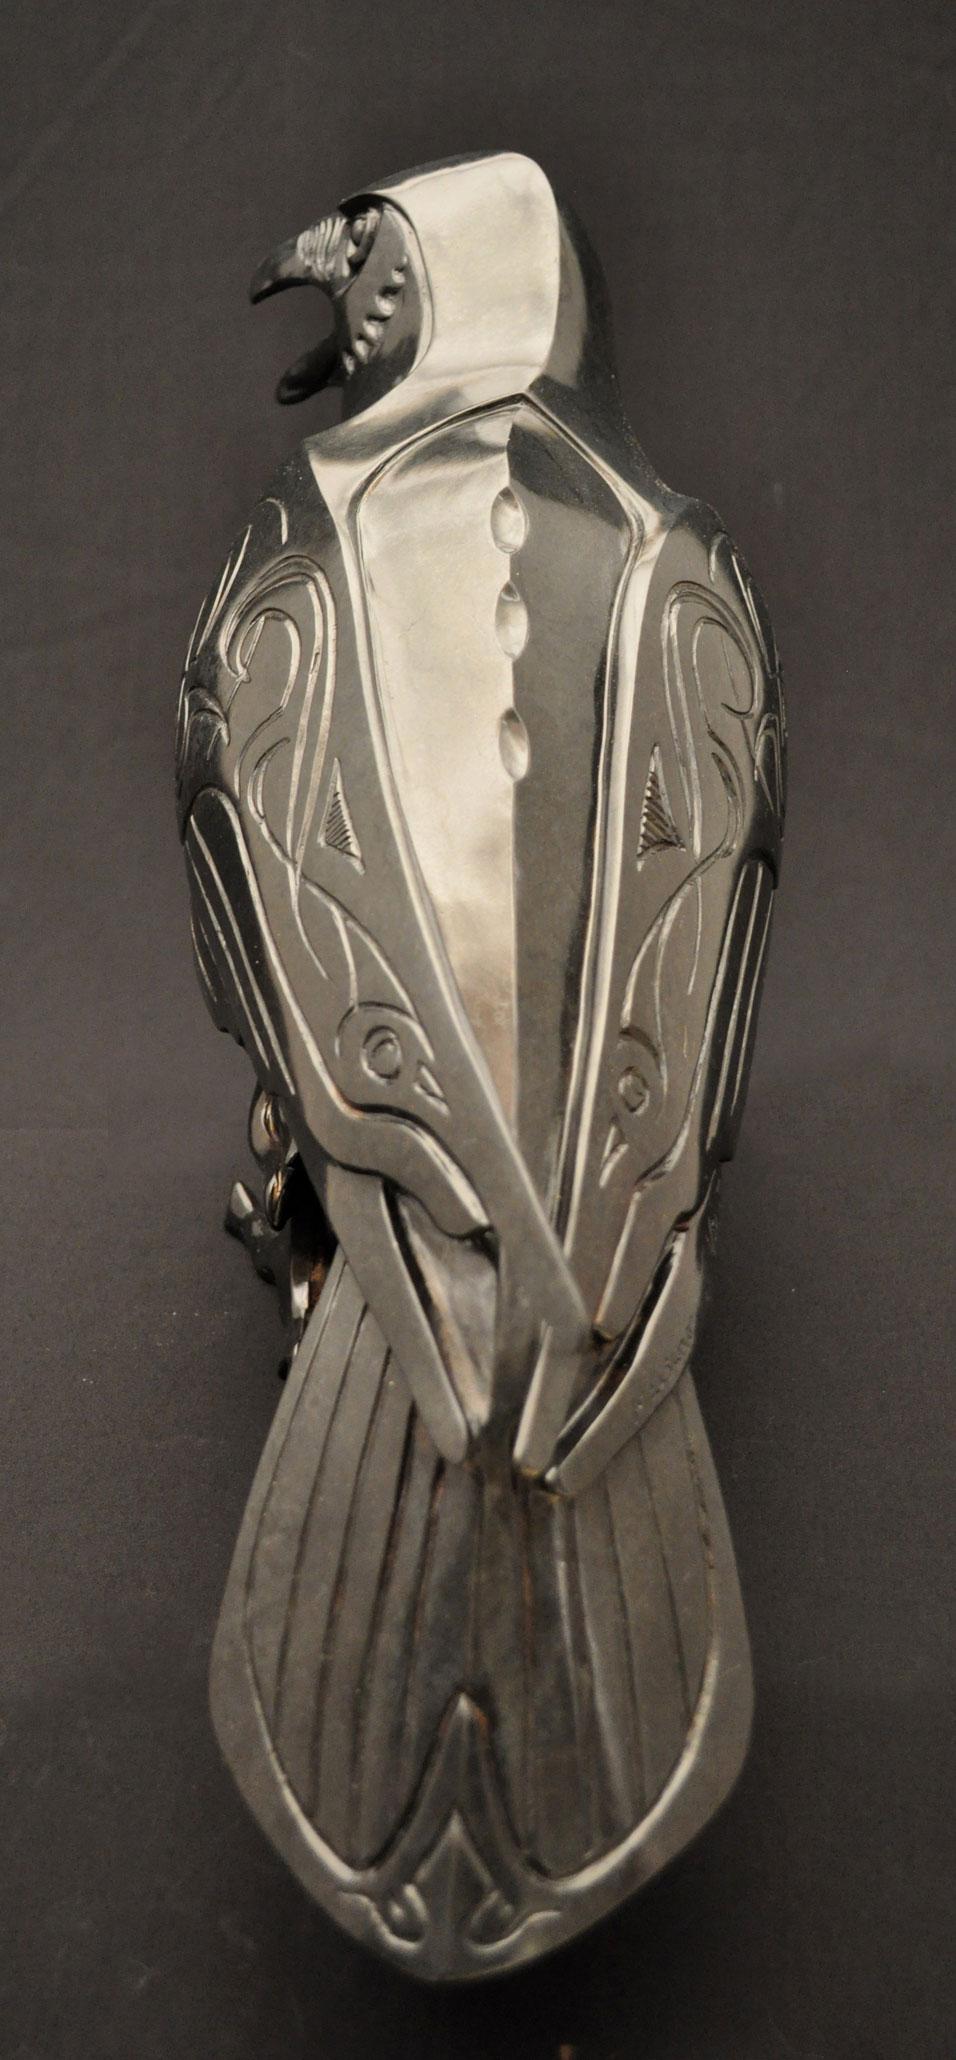 Raven-Sculpture-Bronze-John-Maisano---3.jpg